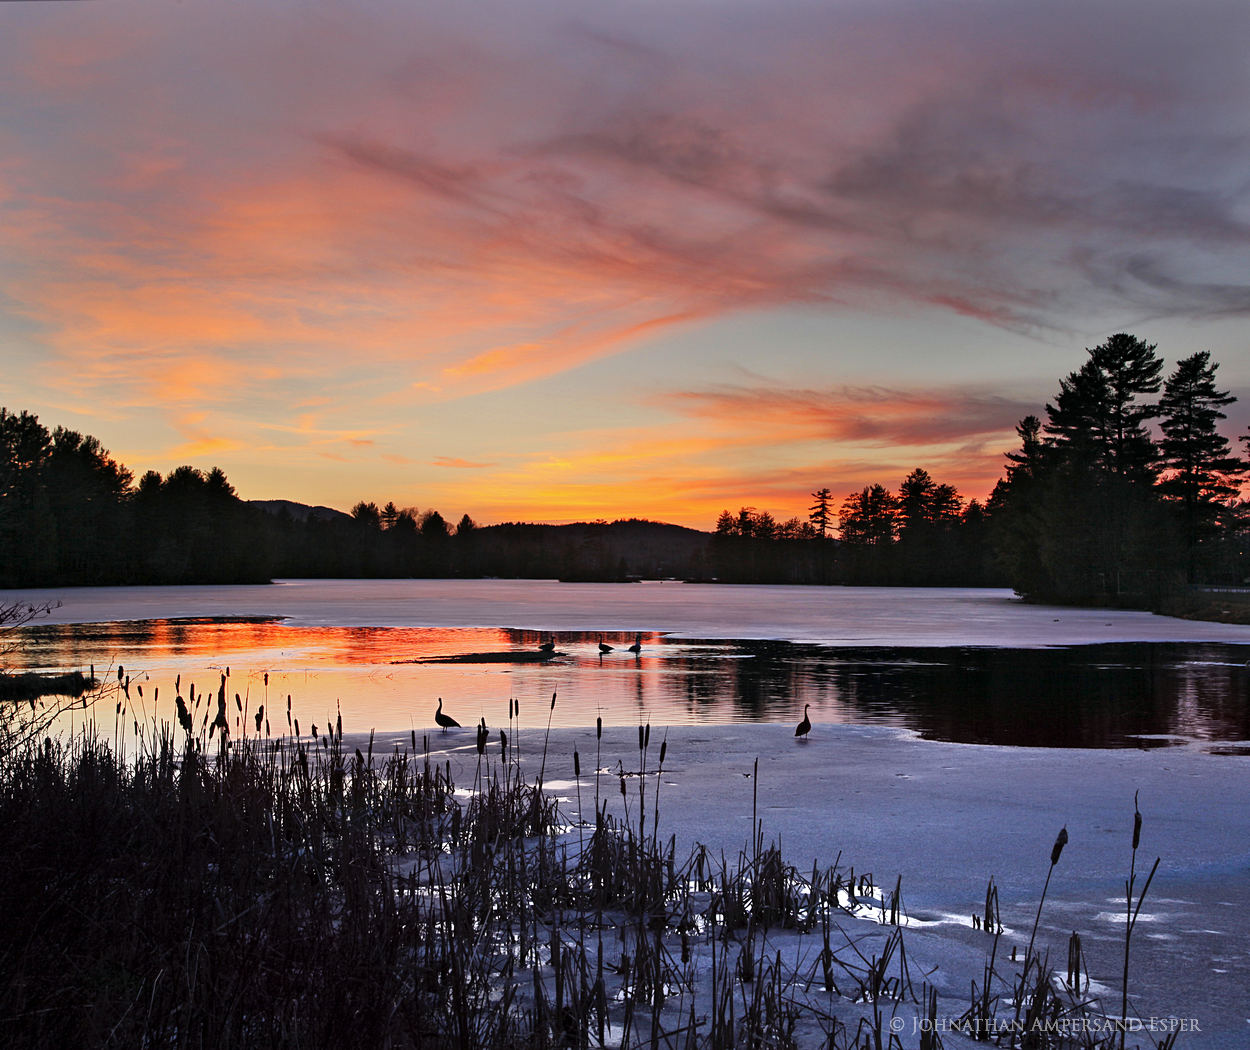 Jennings Pond,Long Lake,Park Pond,Jennings Pond Long Lake,Park Pond Lake Lake,Canada geese,geese,sillouette,spring,ice,spring ice,, photo